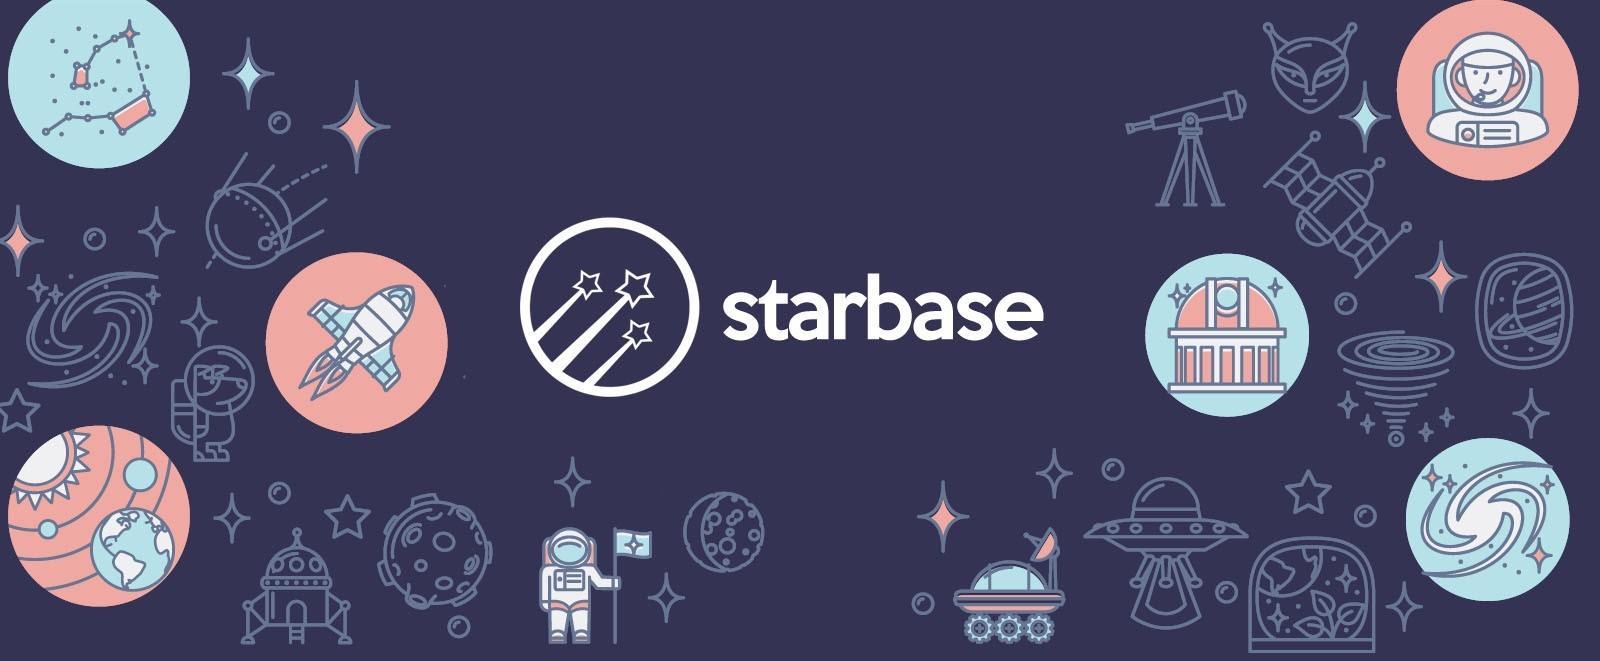 Криптовалюта Starbase